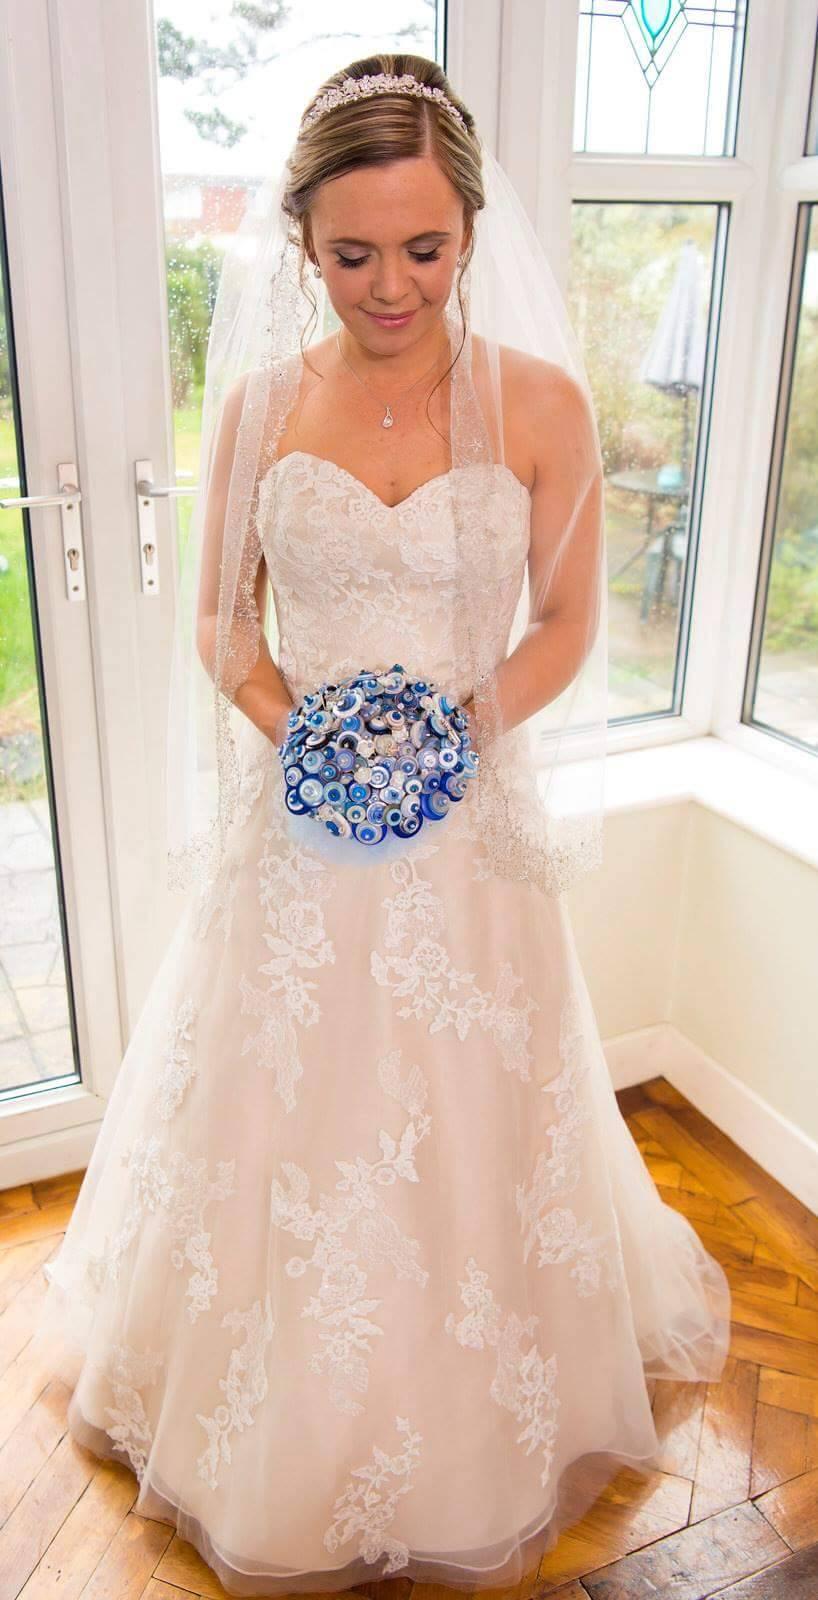 Bride of the Month!! — Cheadle Bride